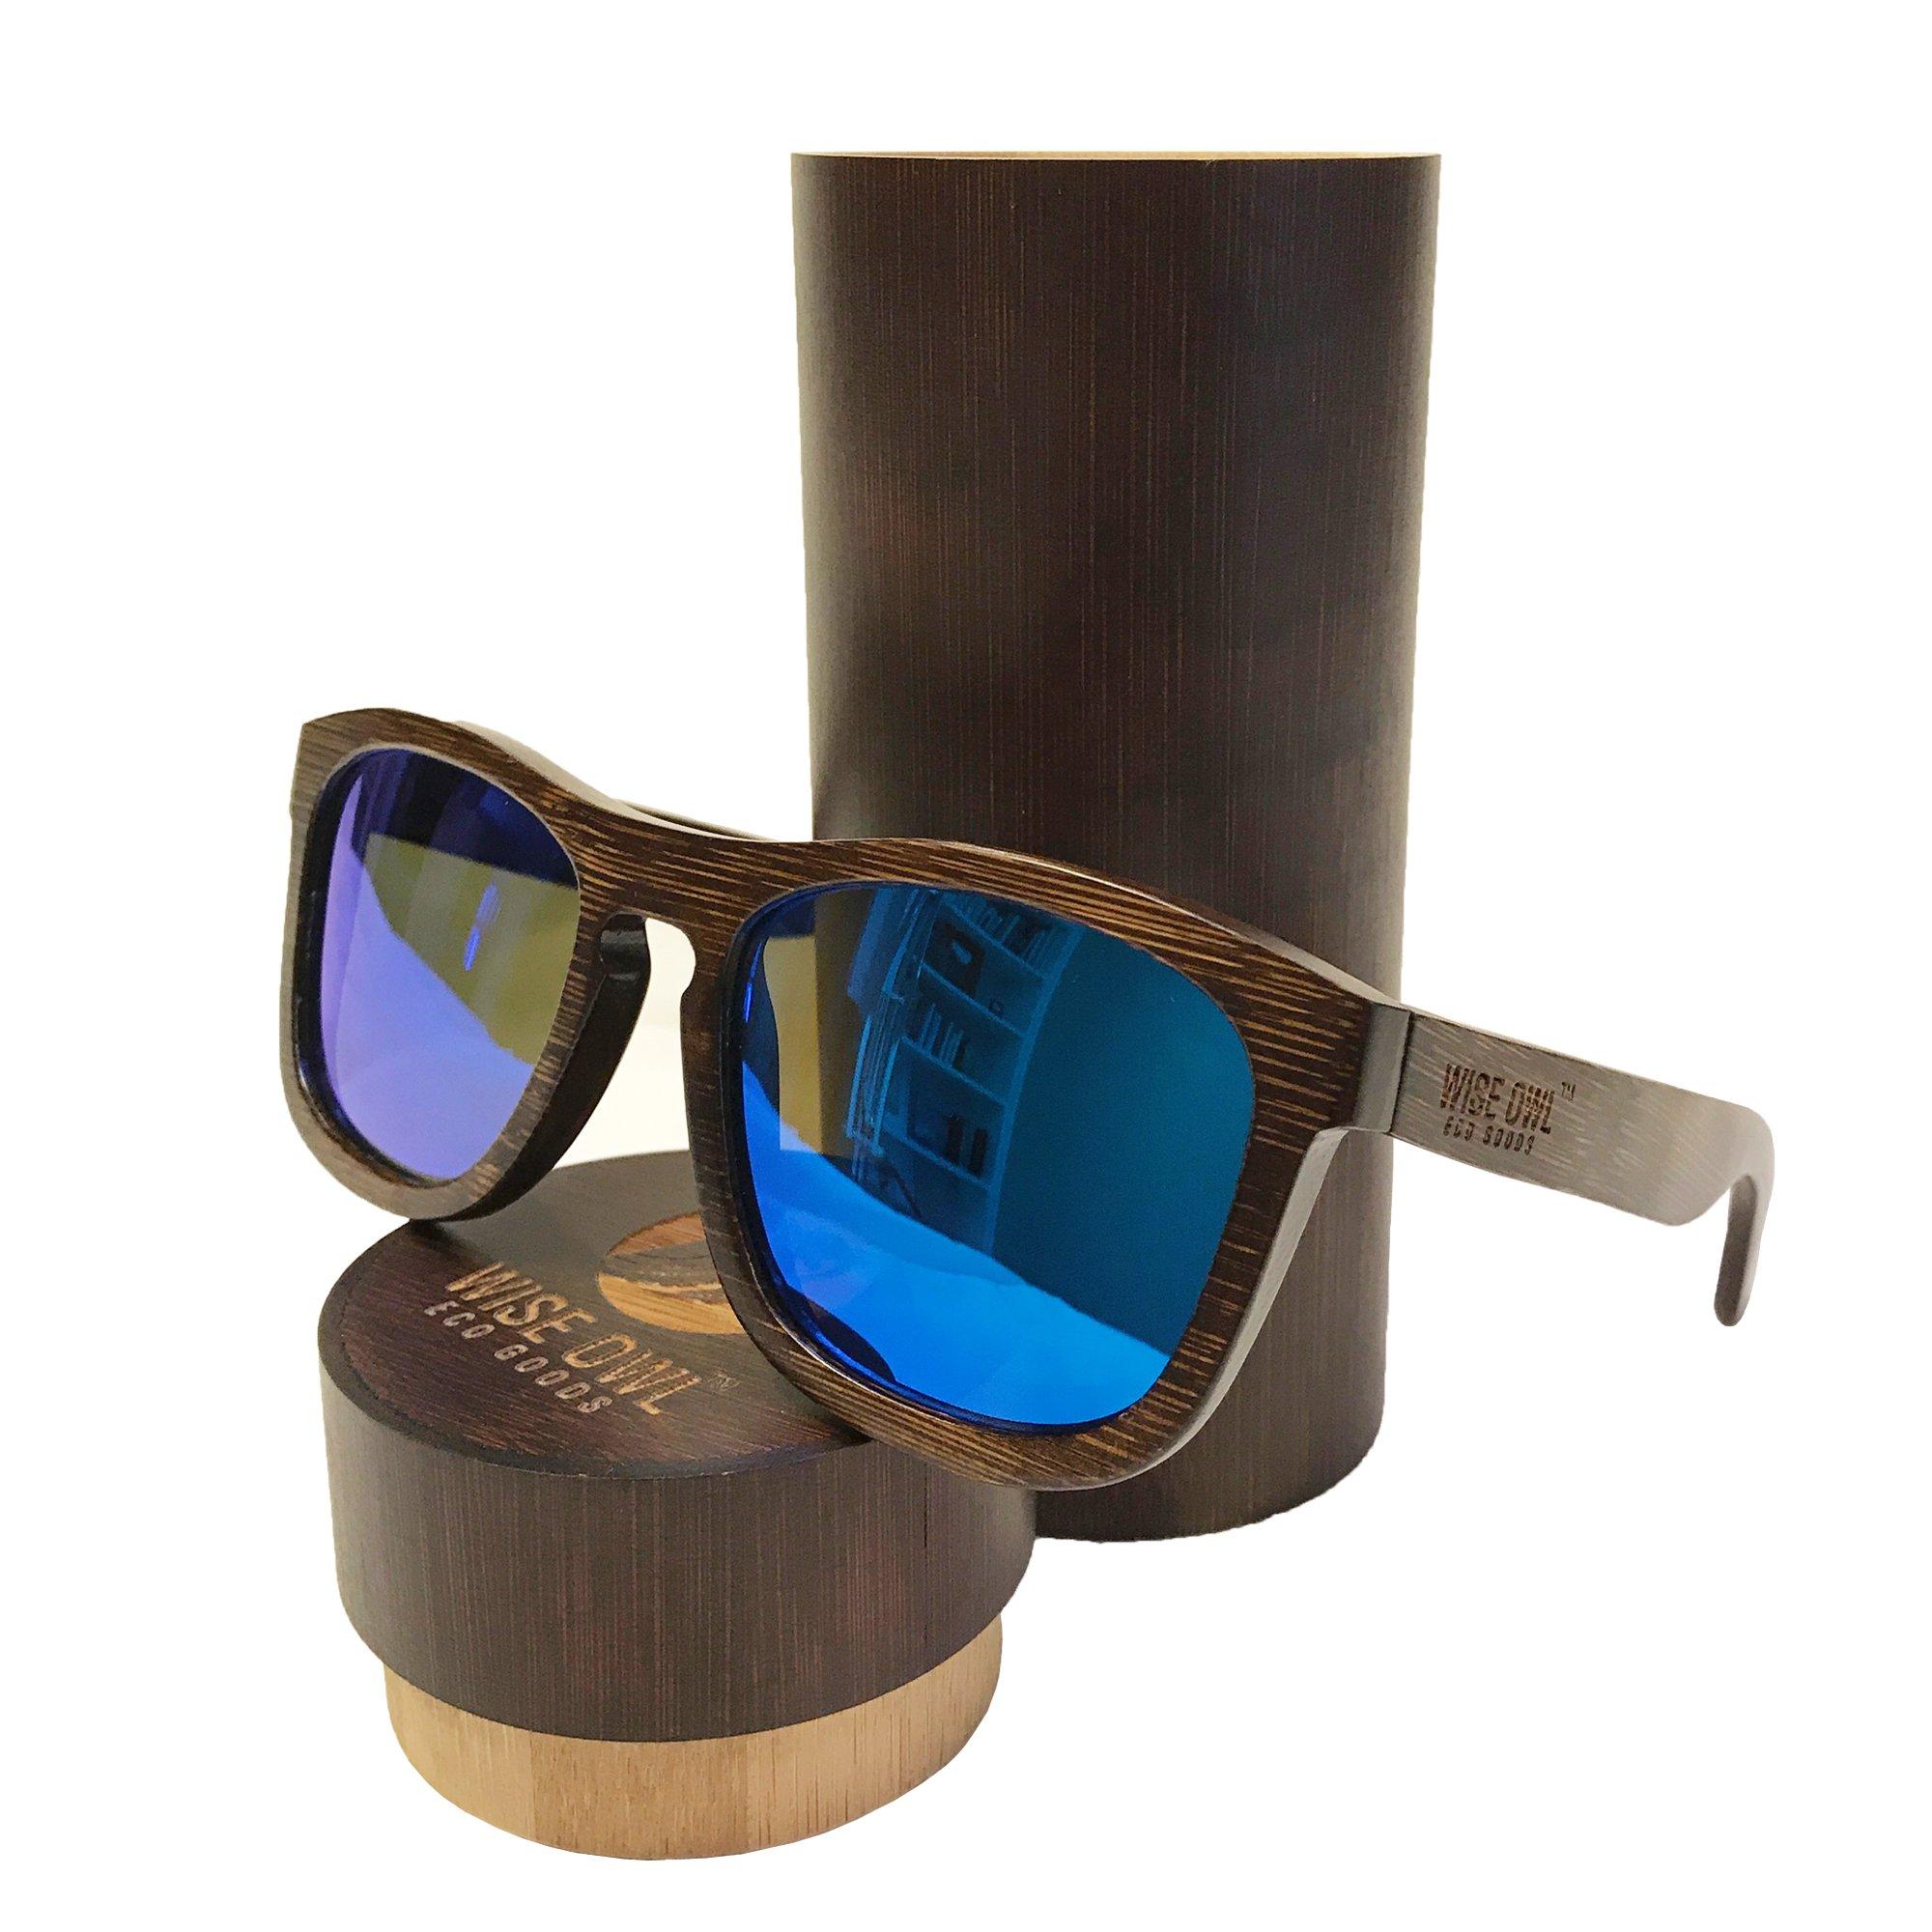 Unisex & 100% Bamboo Wood POLARIZED Sunglasses   Eco-Friendly & Sturdy Wayfarer